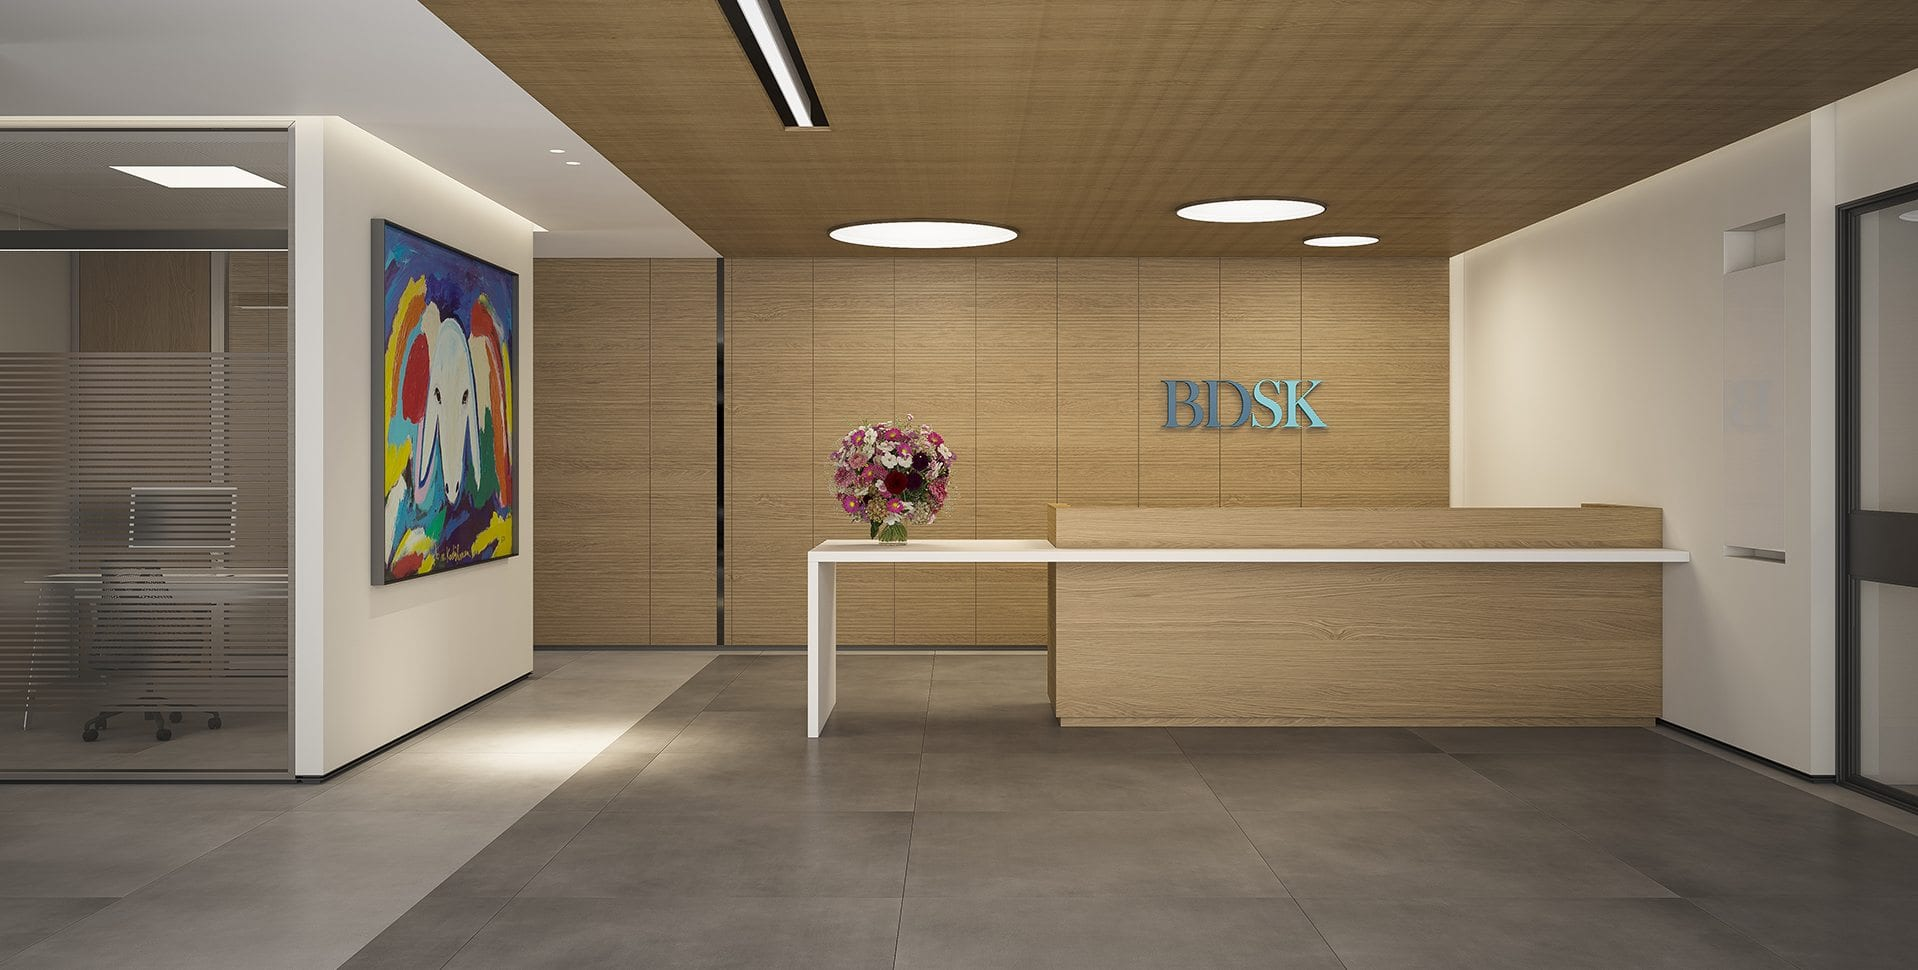 Maayan-Golan_Architectural-Visualization_ bdsk-office-visualization_elevator-hall_design-dunski-architects_04